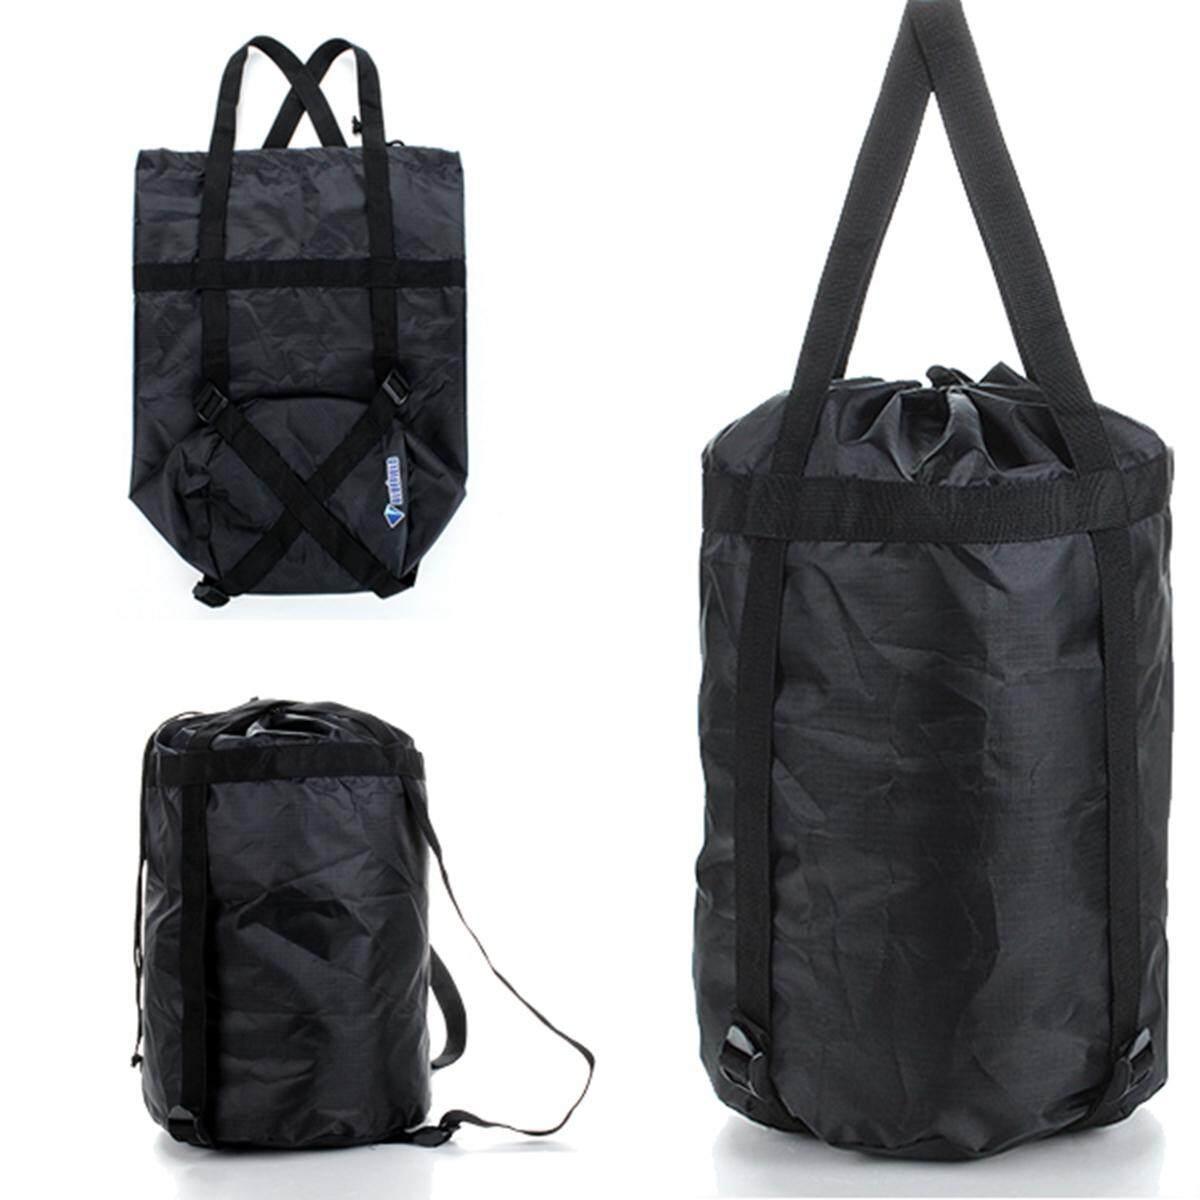 Hình ảnh Large Lightweight Waterproof Outdoor Camping Sleeping Compression Bag Stuff Bag